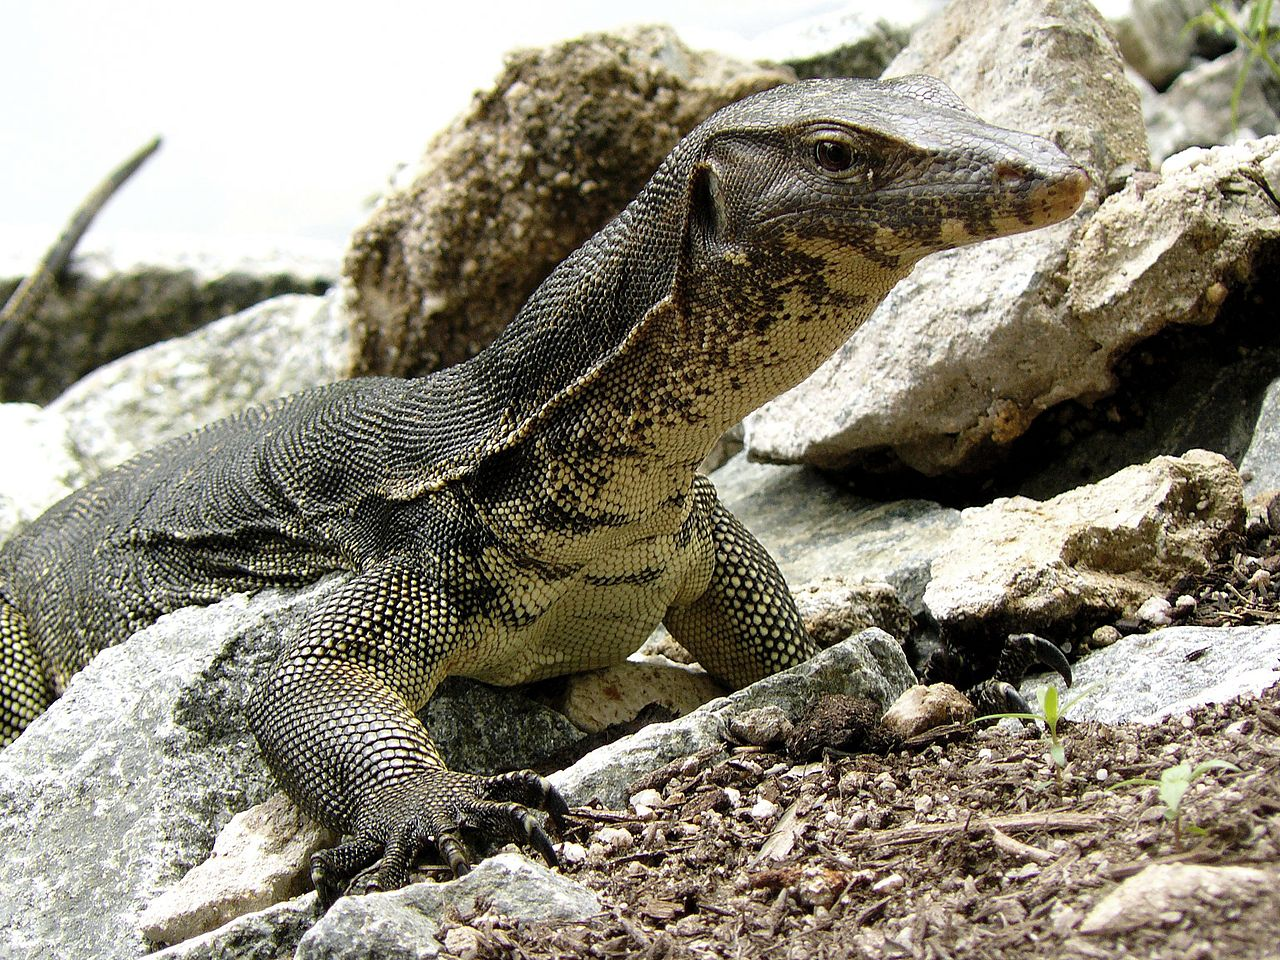 File:Monitor Lizard Sungei Buloh Wetlands Reserve